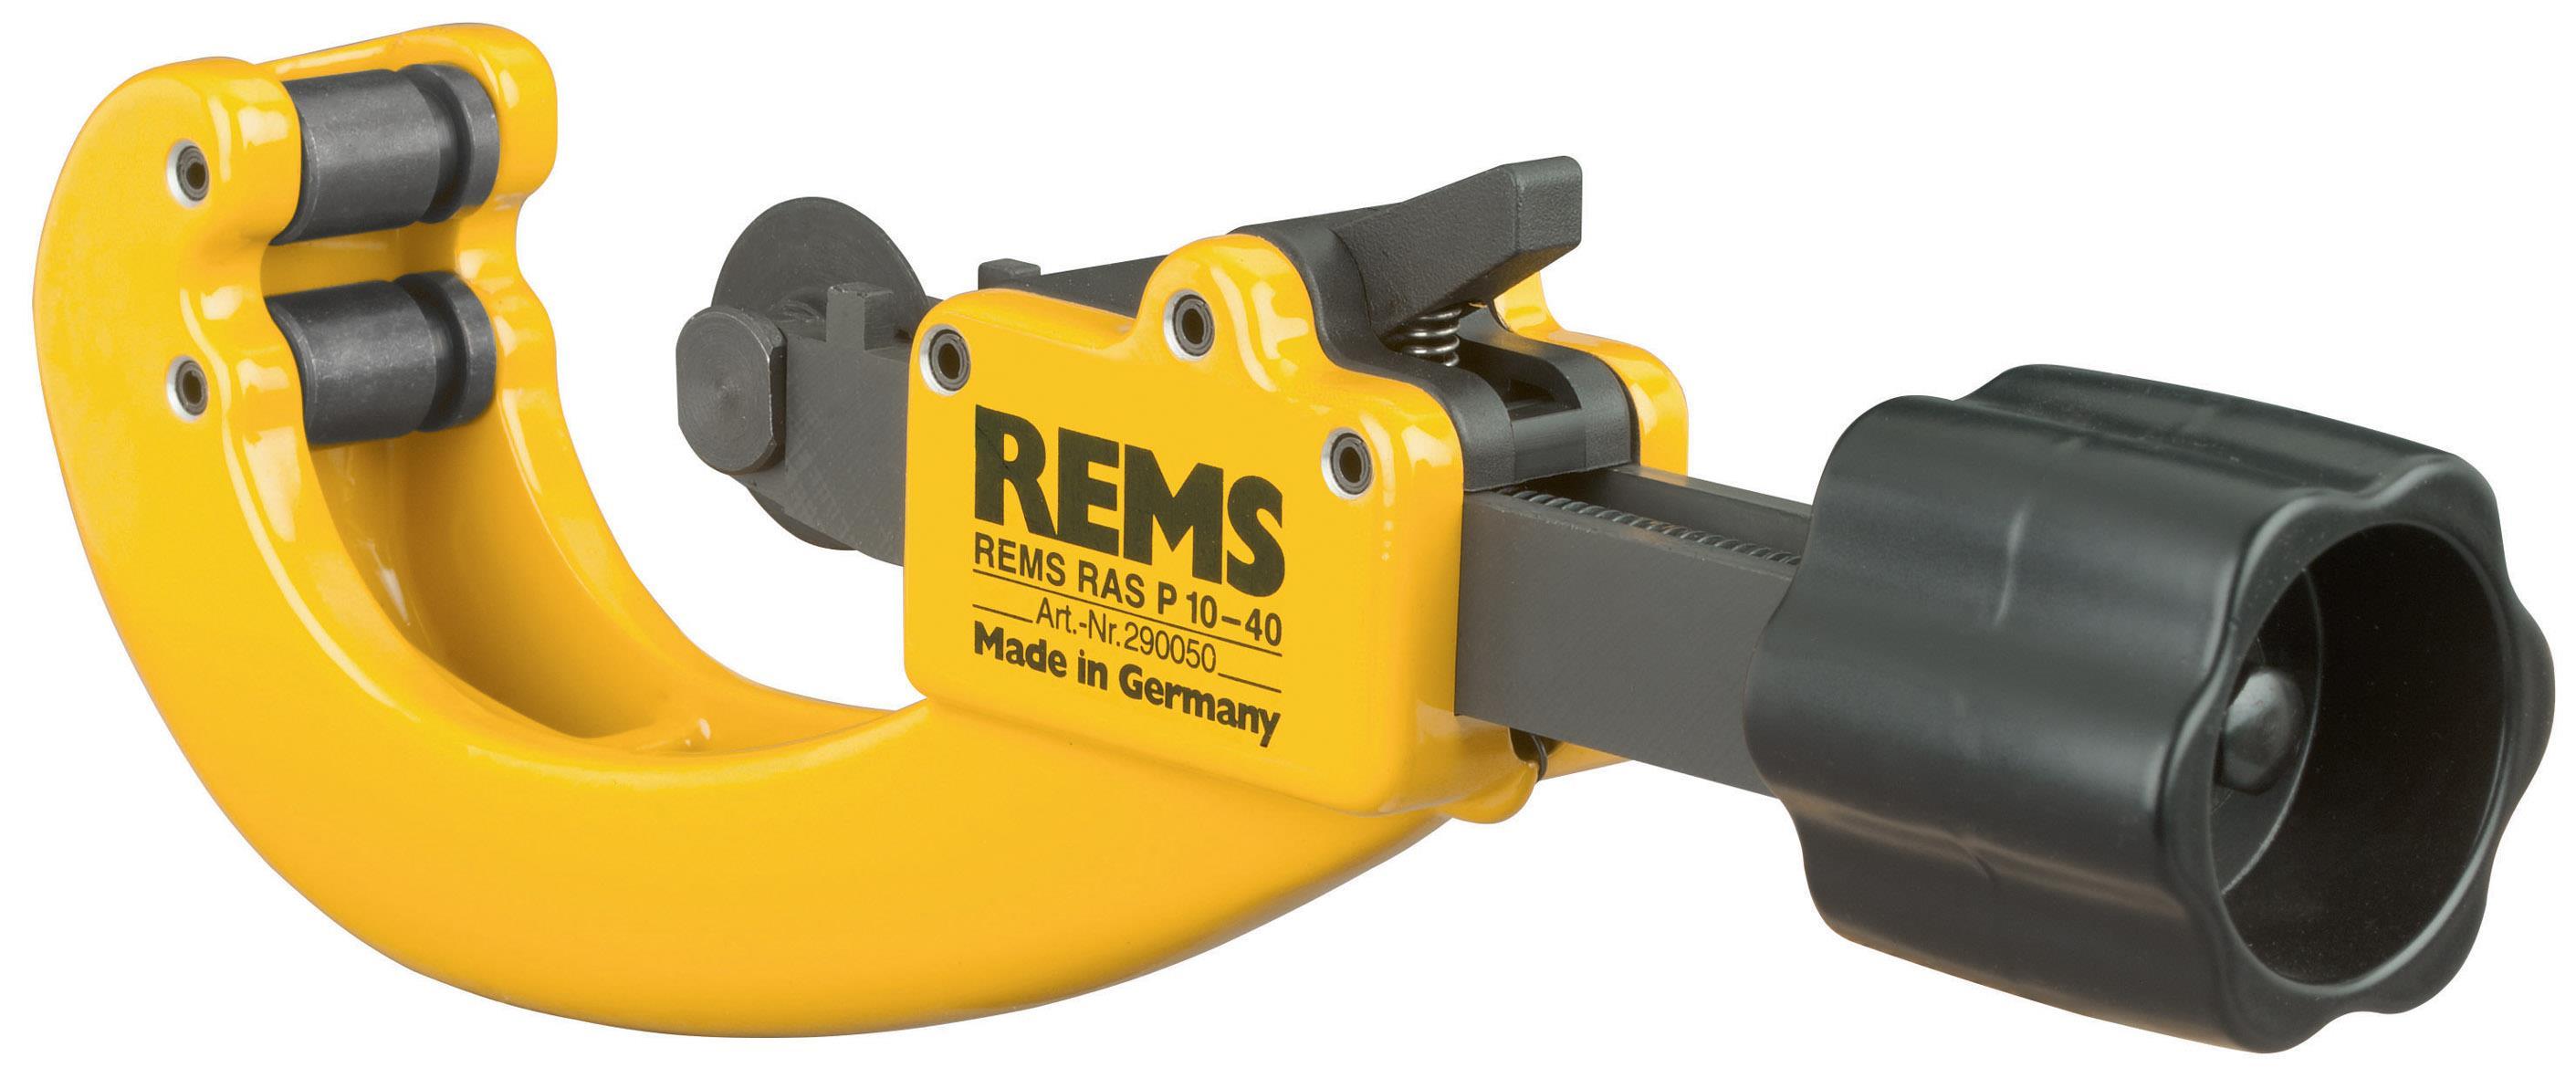 REMS RAS P Röravskärare 10-40